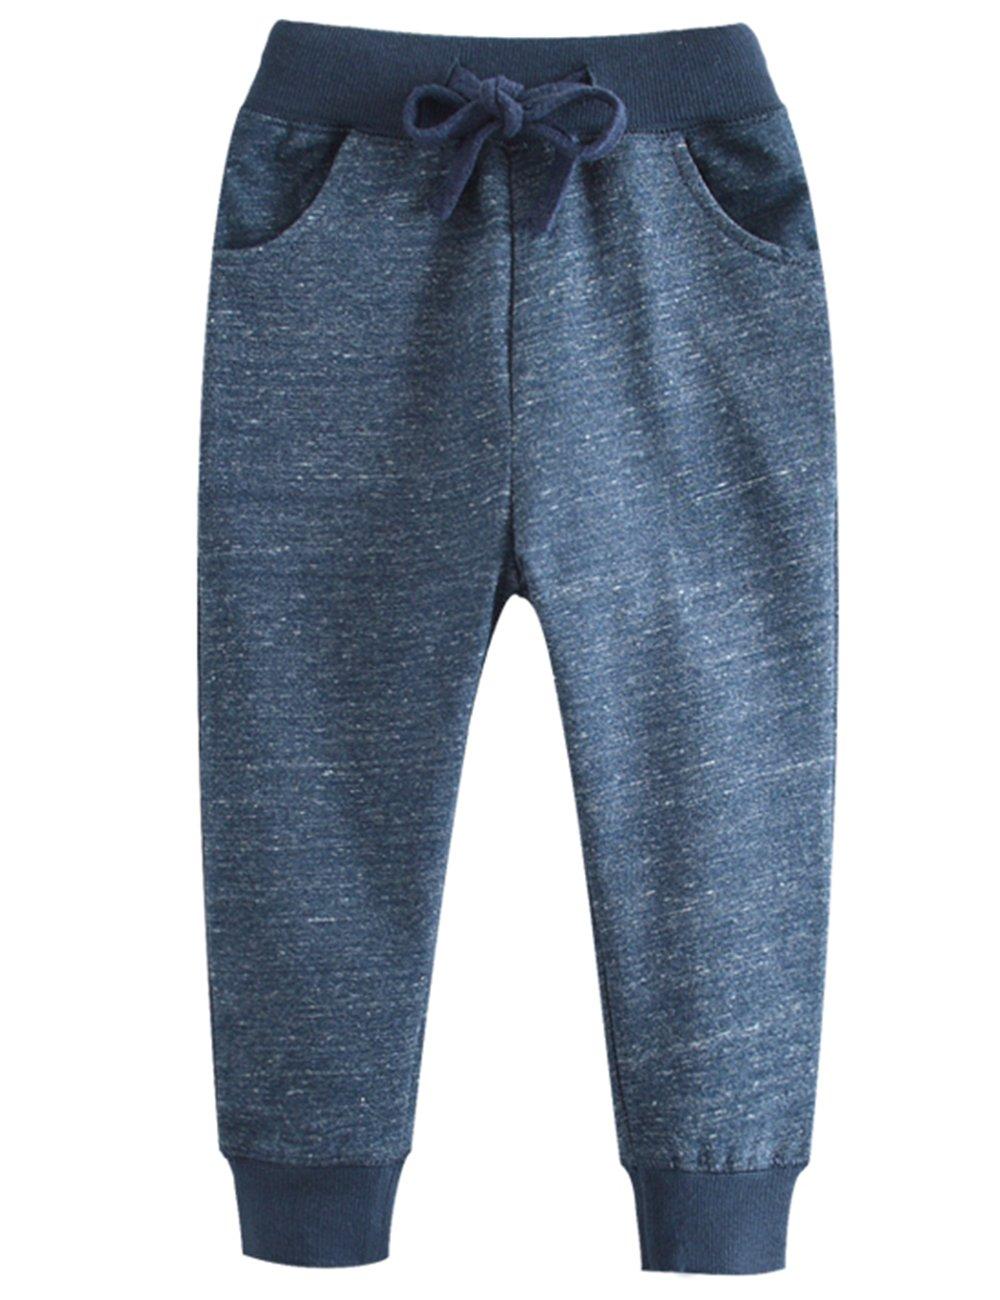 Dola-dola Baby Boys Kids Toddler Cotton Trousers Harem Pants Sport Jogger CB302 (3T, NavyBlue)